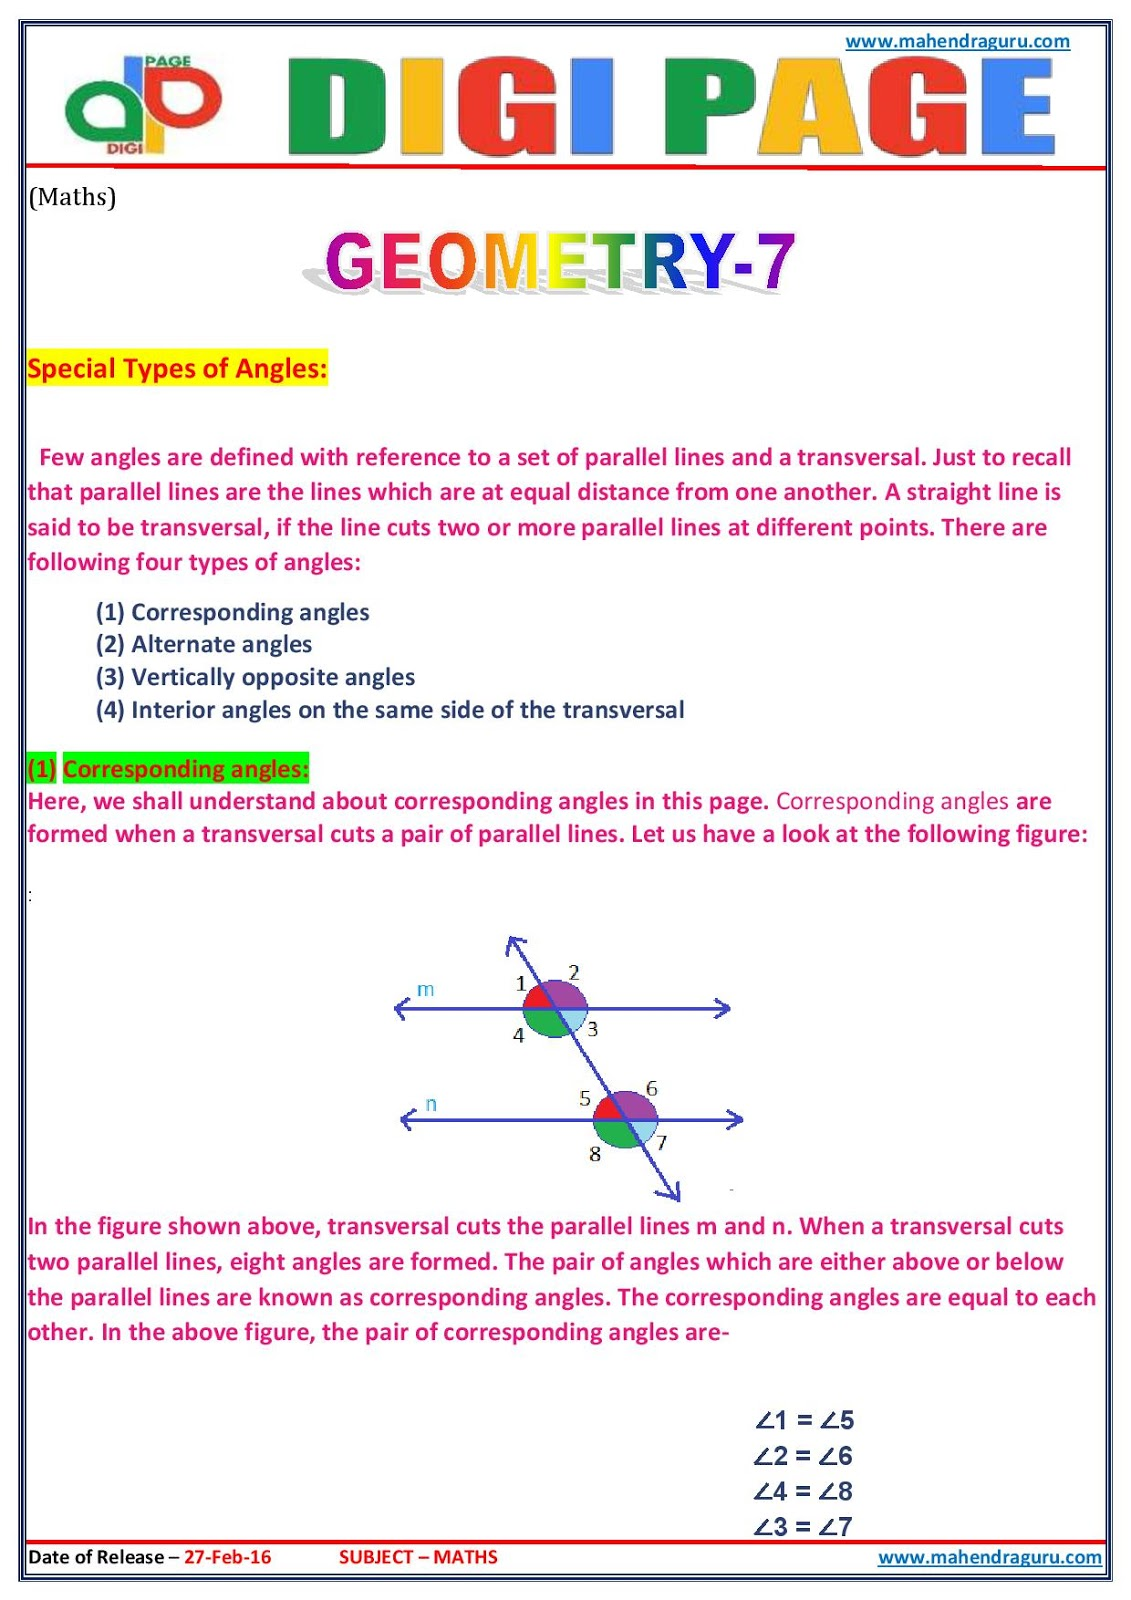 mast guru current affairs pdf